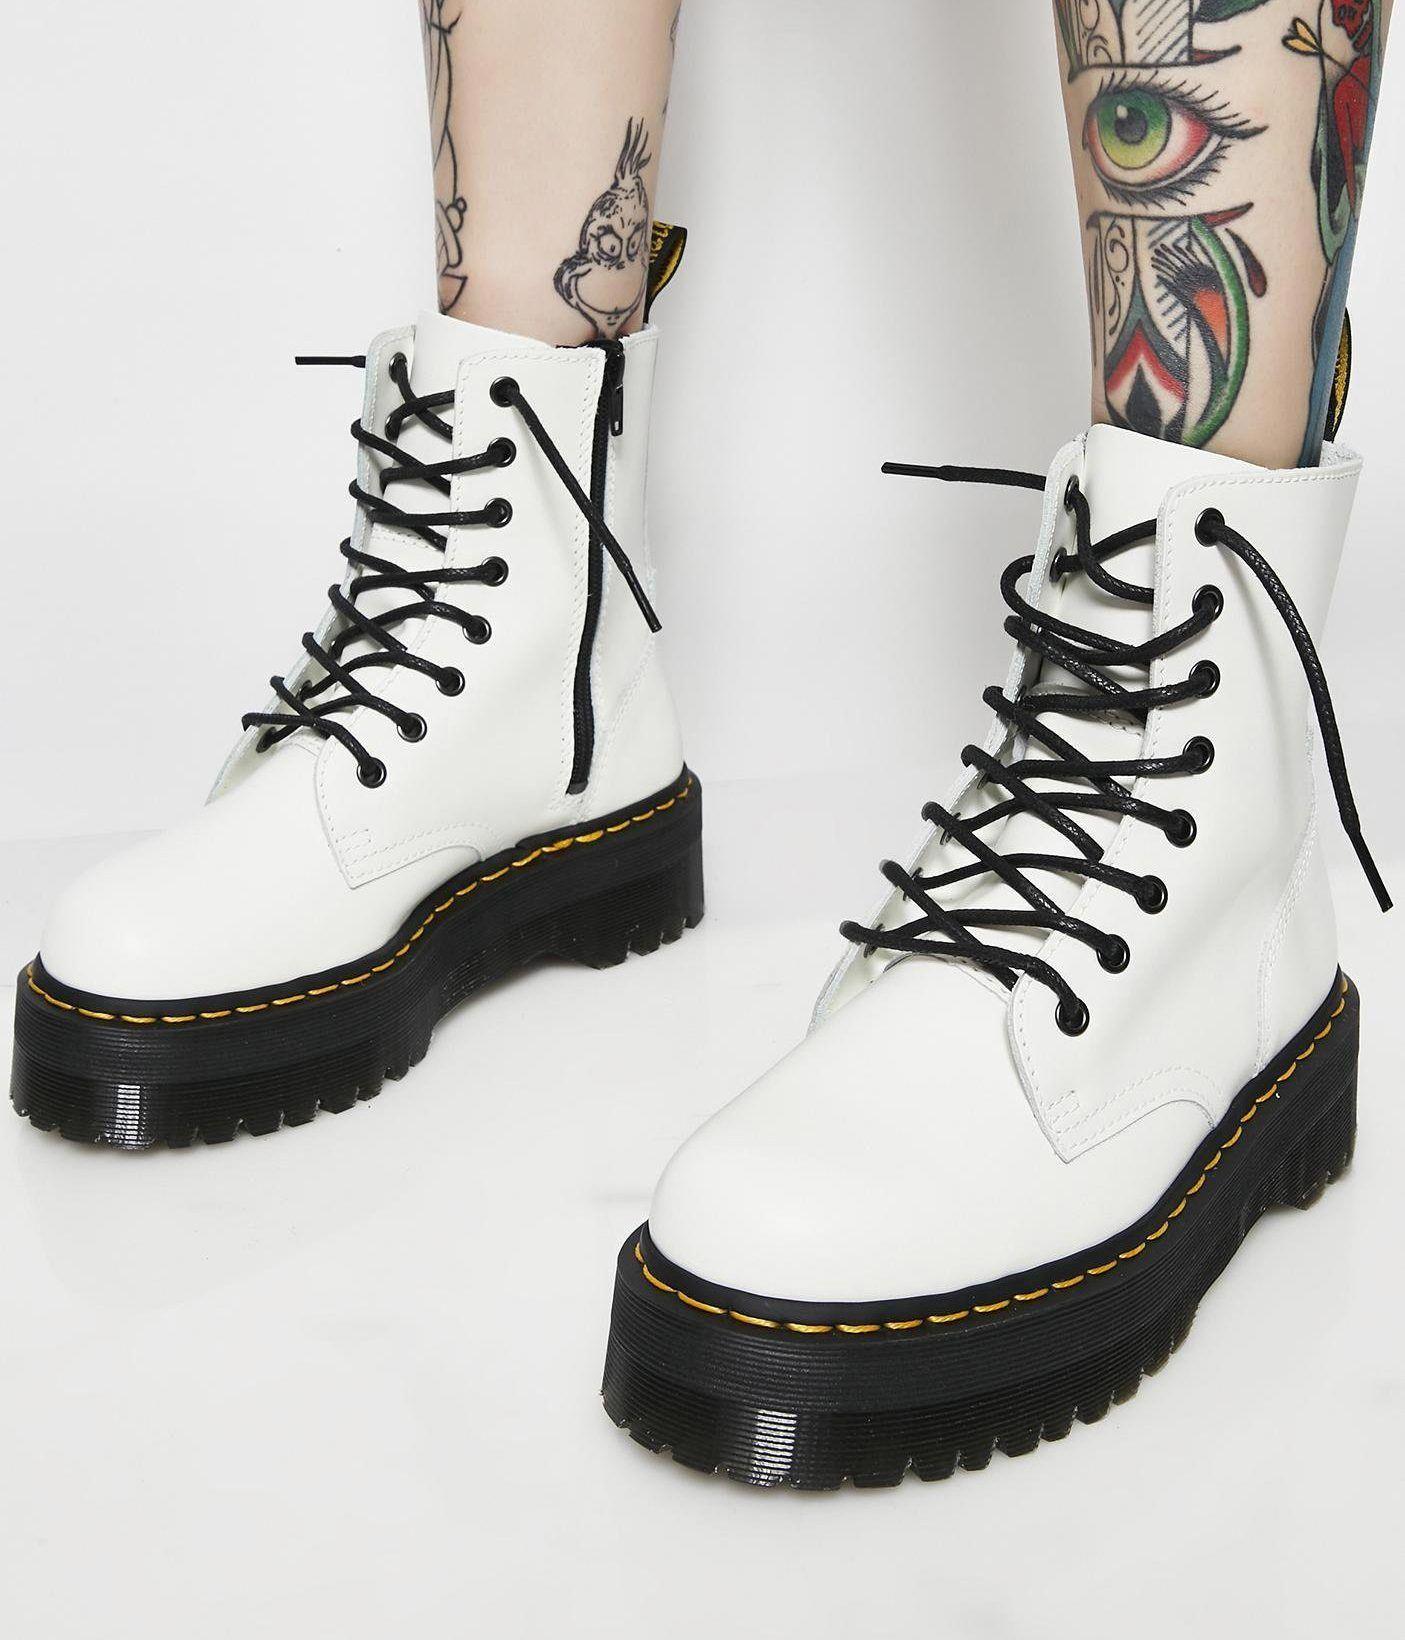 Dr. Martens White Jadon 8 Eye Boots #Drmartensstyle